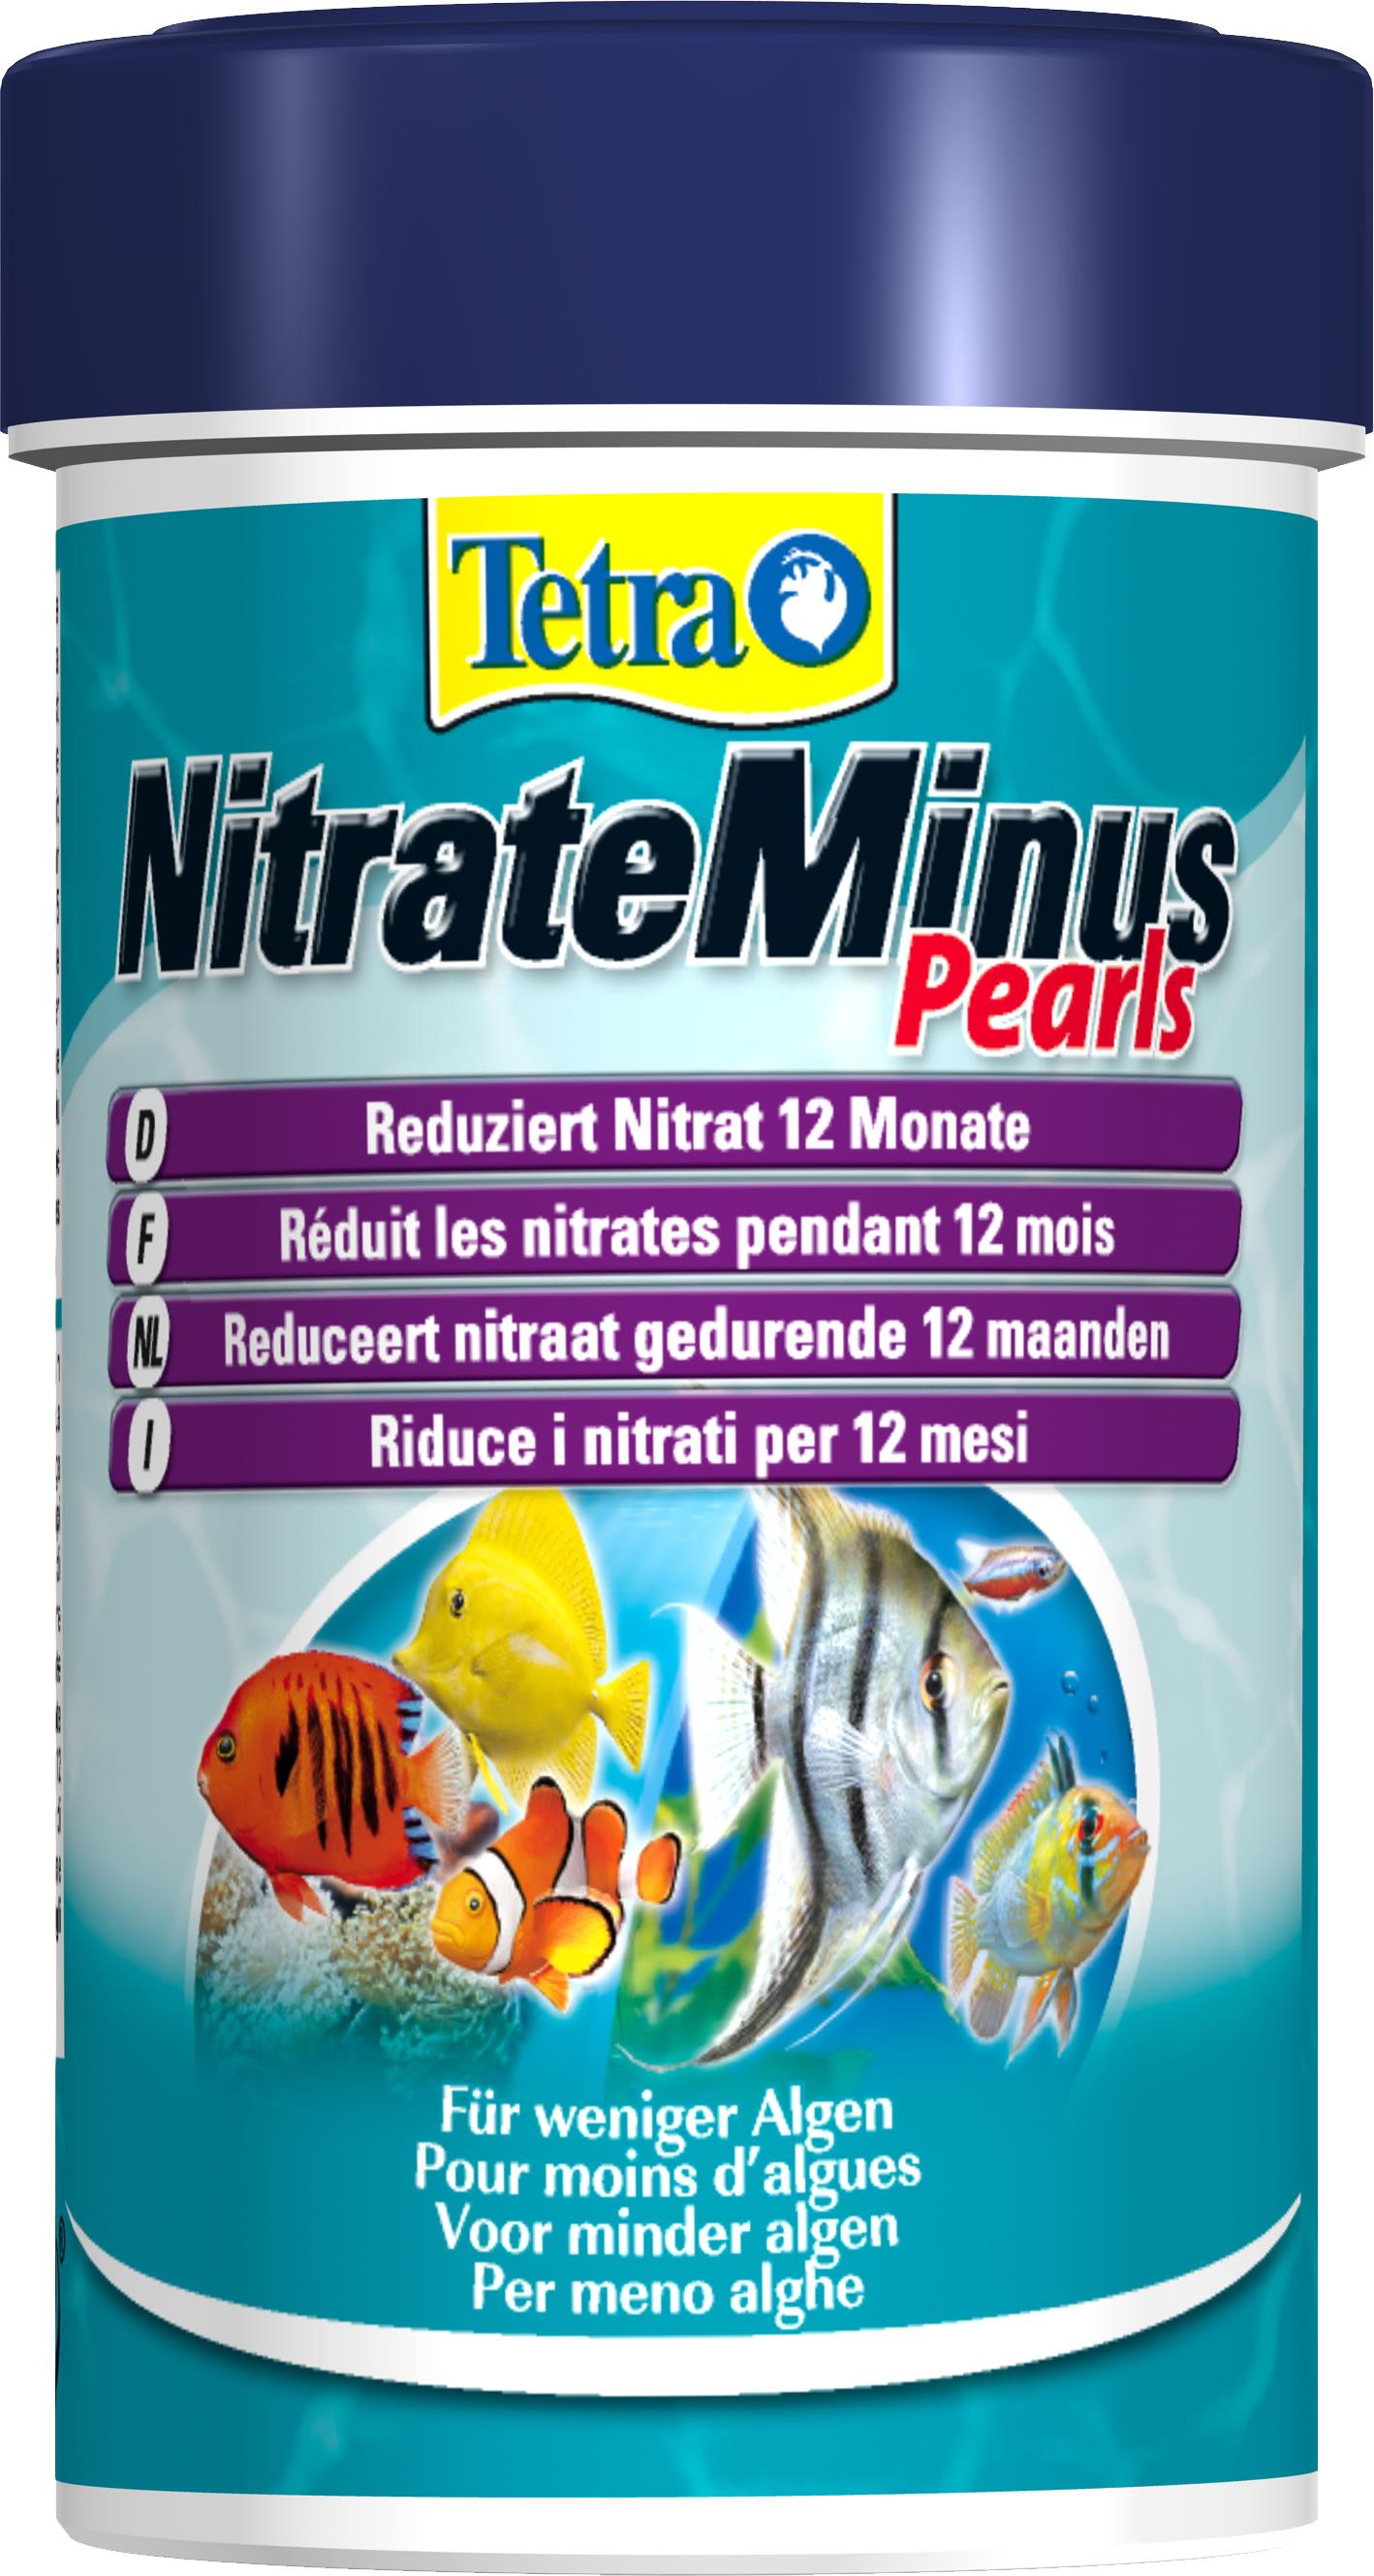 TetraAqua NitrateMinus Pearls